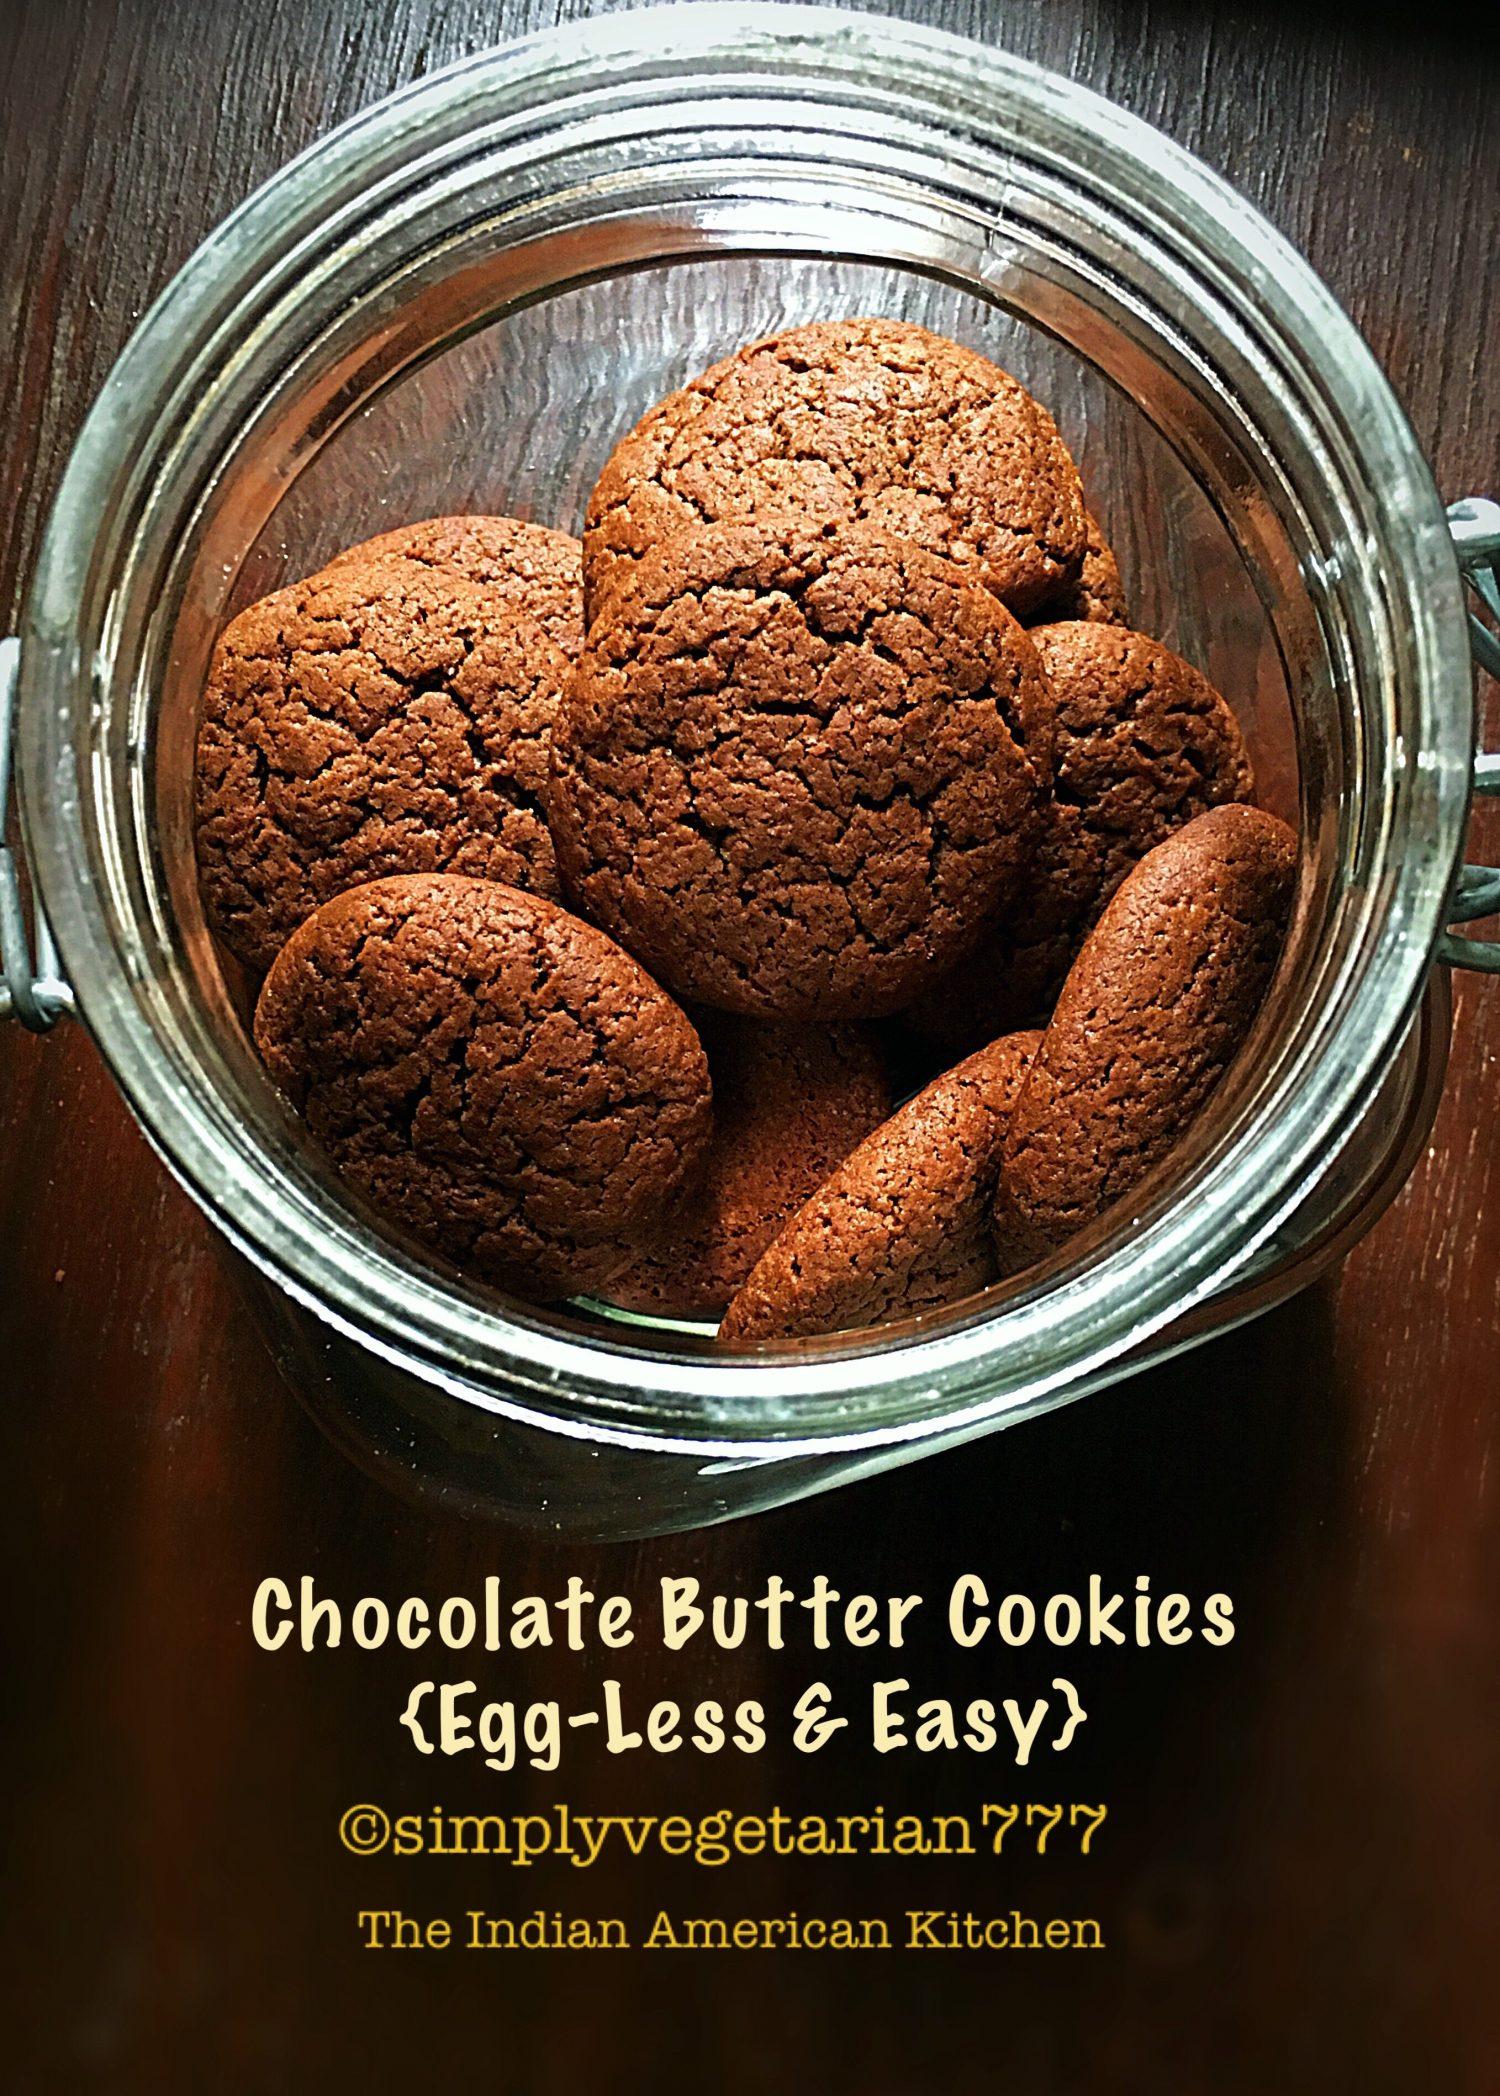 Chocolate Cookies - Eggless & Easy Recipe to make cookies at home